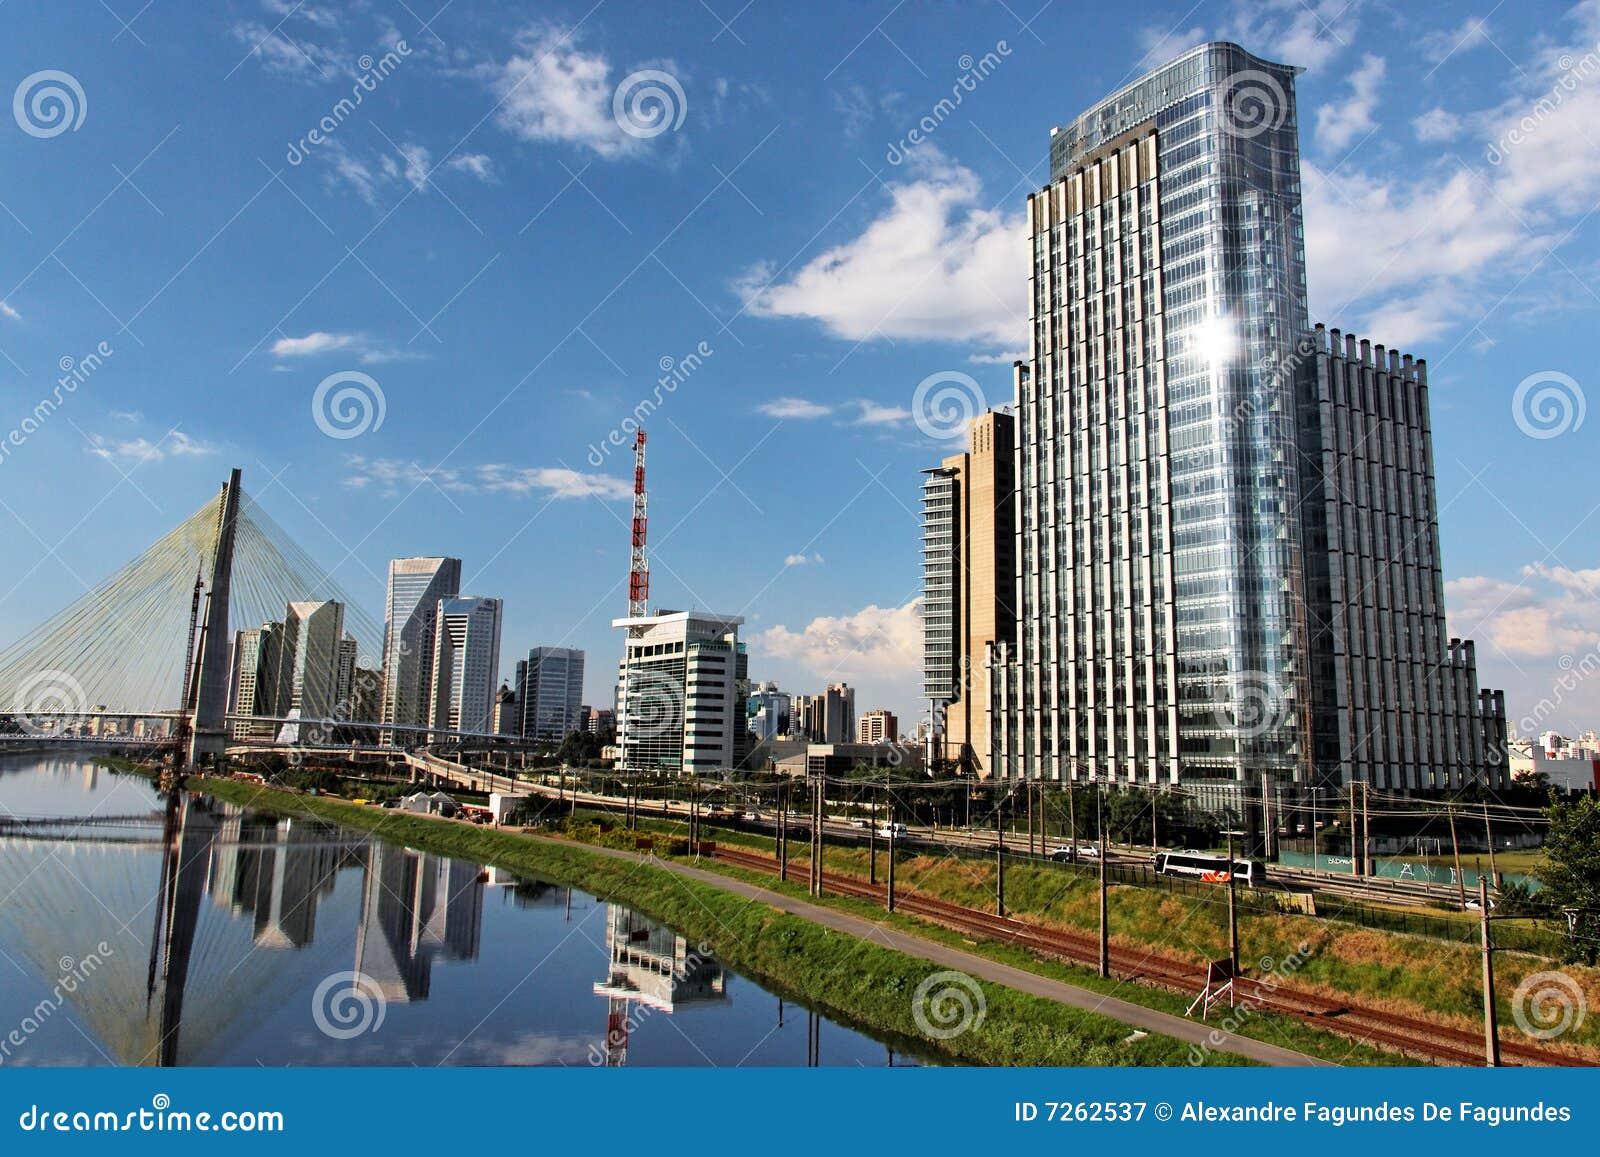 Brooklin and Marginal Pinheiros Sao Paulo Brazil